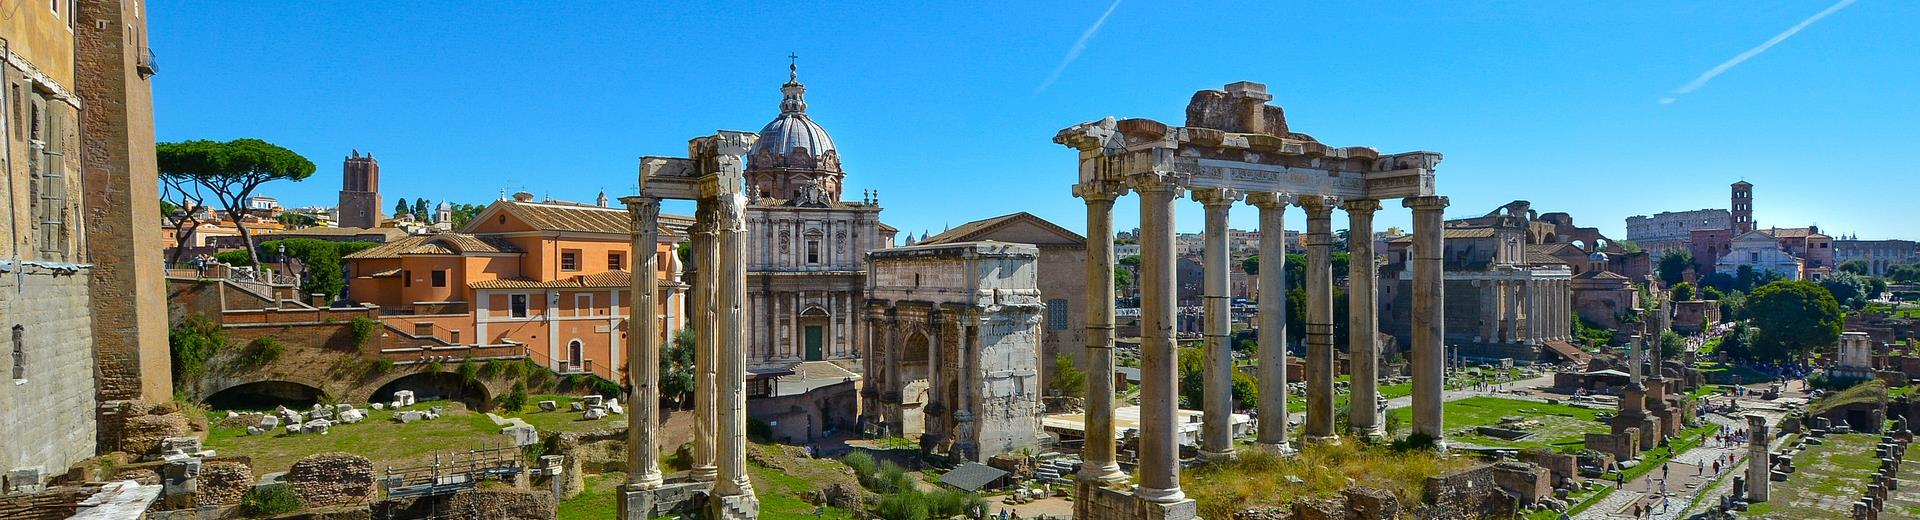 Best Western Globus Hotel Roma Booking